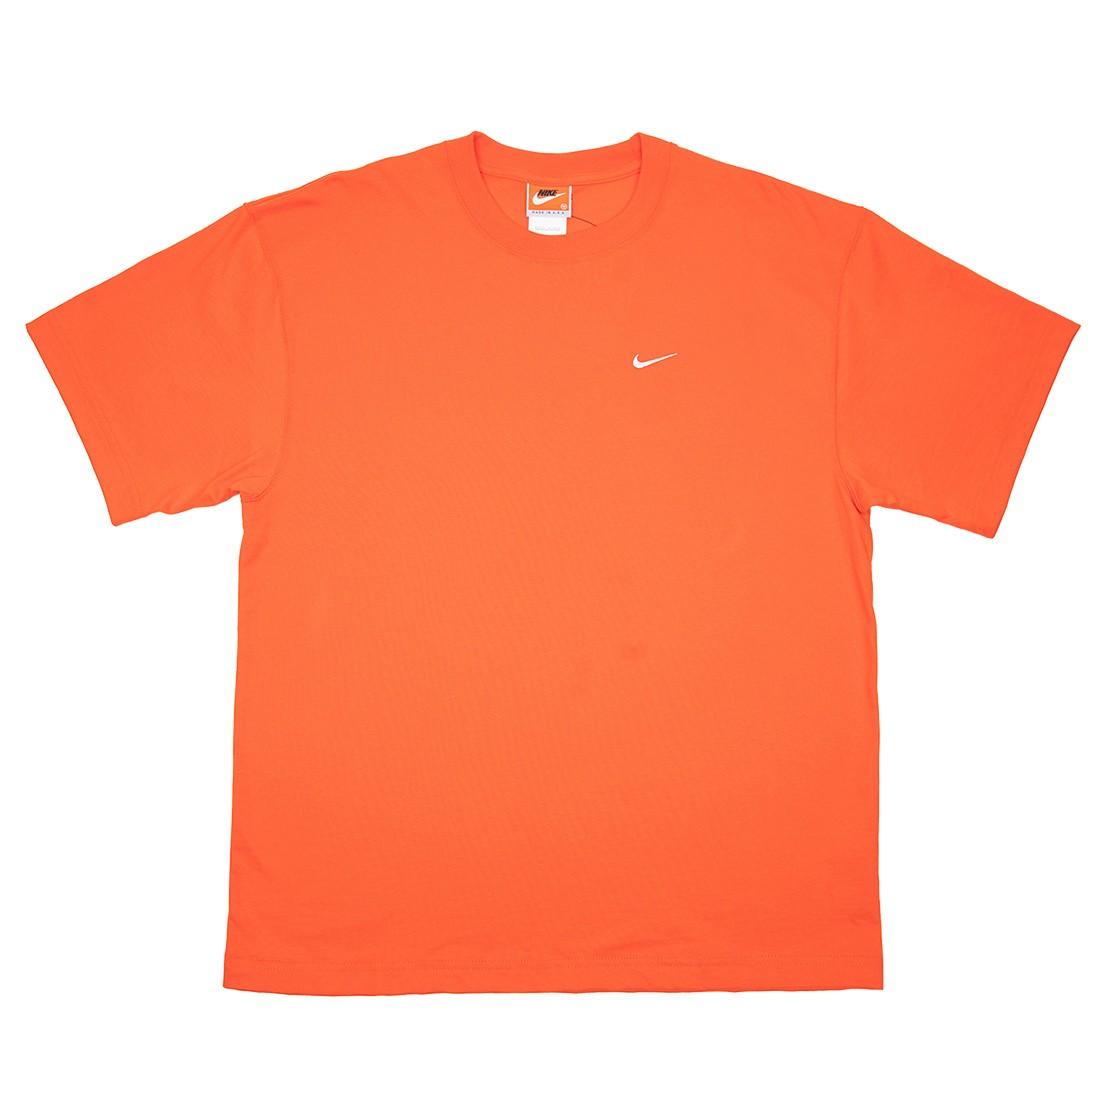 Nike Men Made In The Usa Tee (team orange / white)